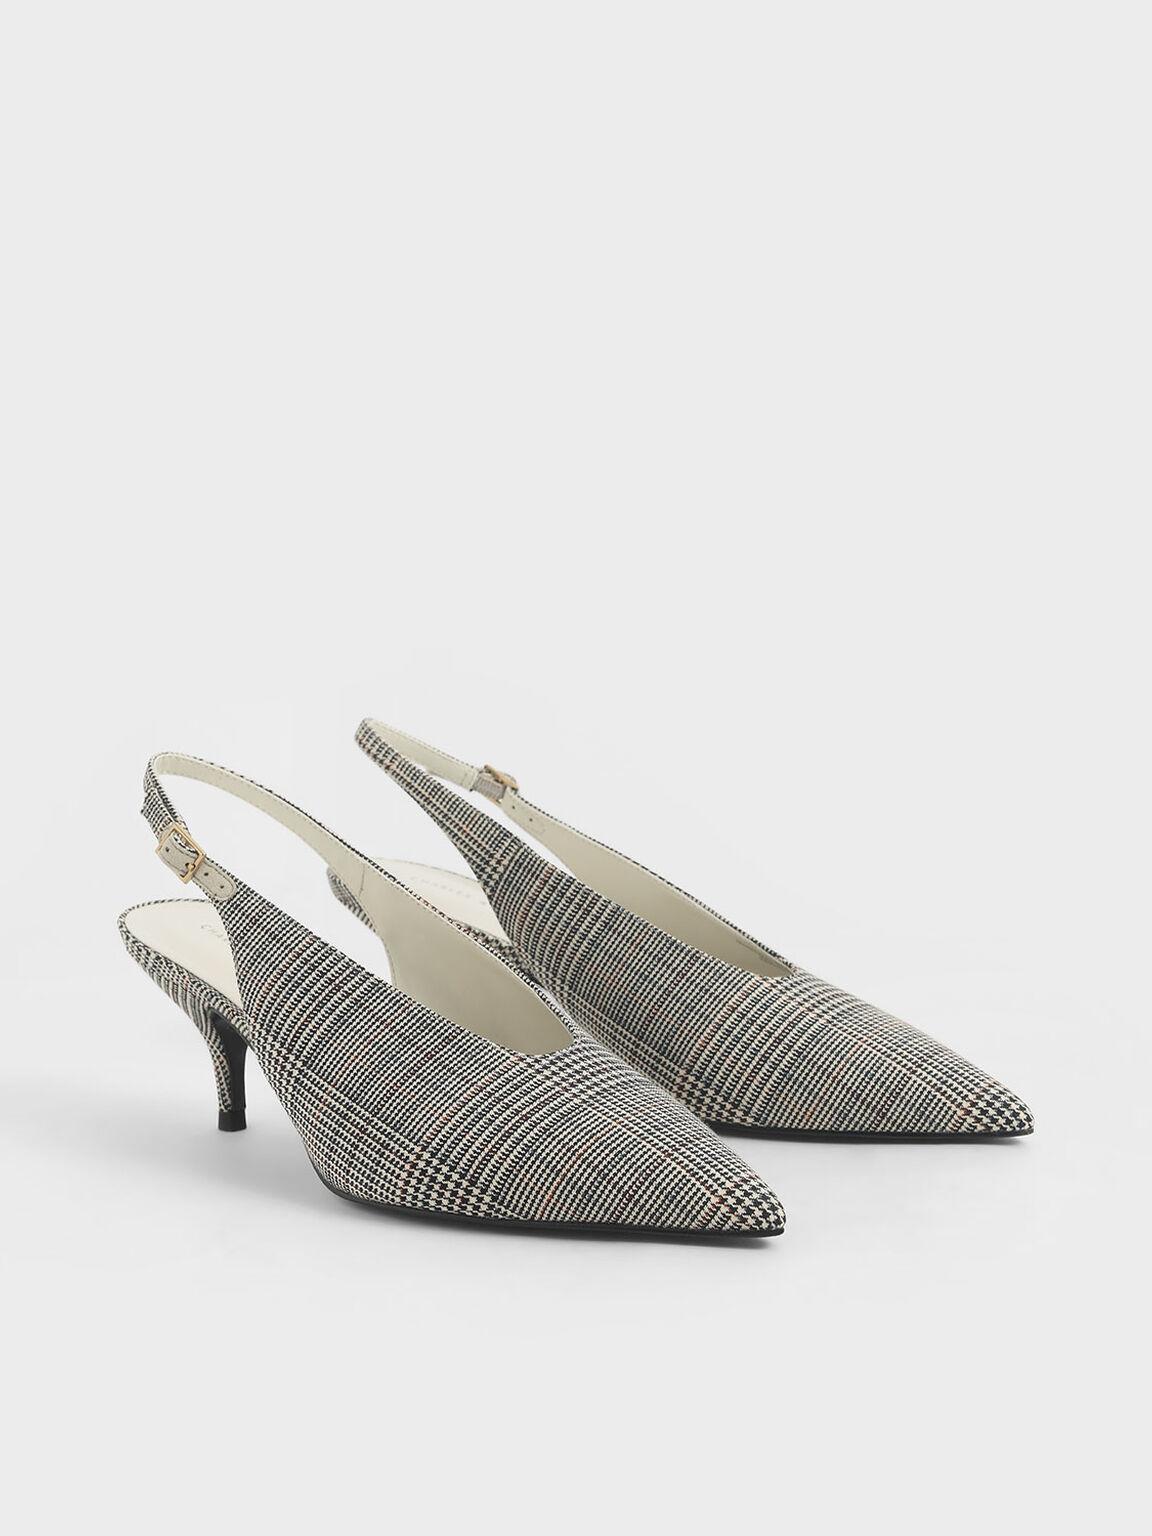 Sepatu Check-Print Pointed Toe Slingback Pumps, Light Grey, hi-res